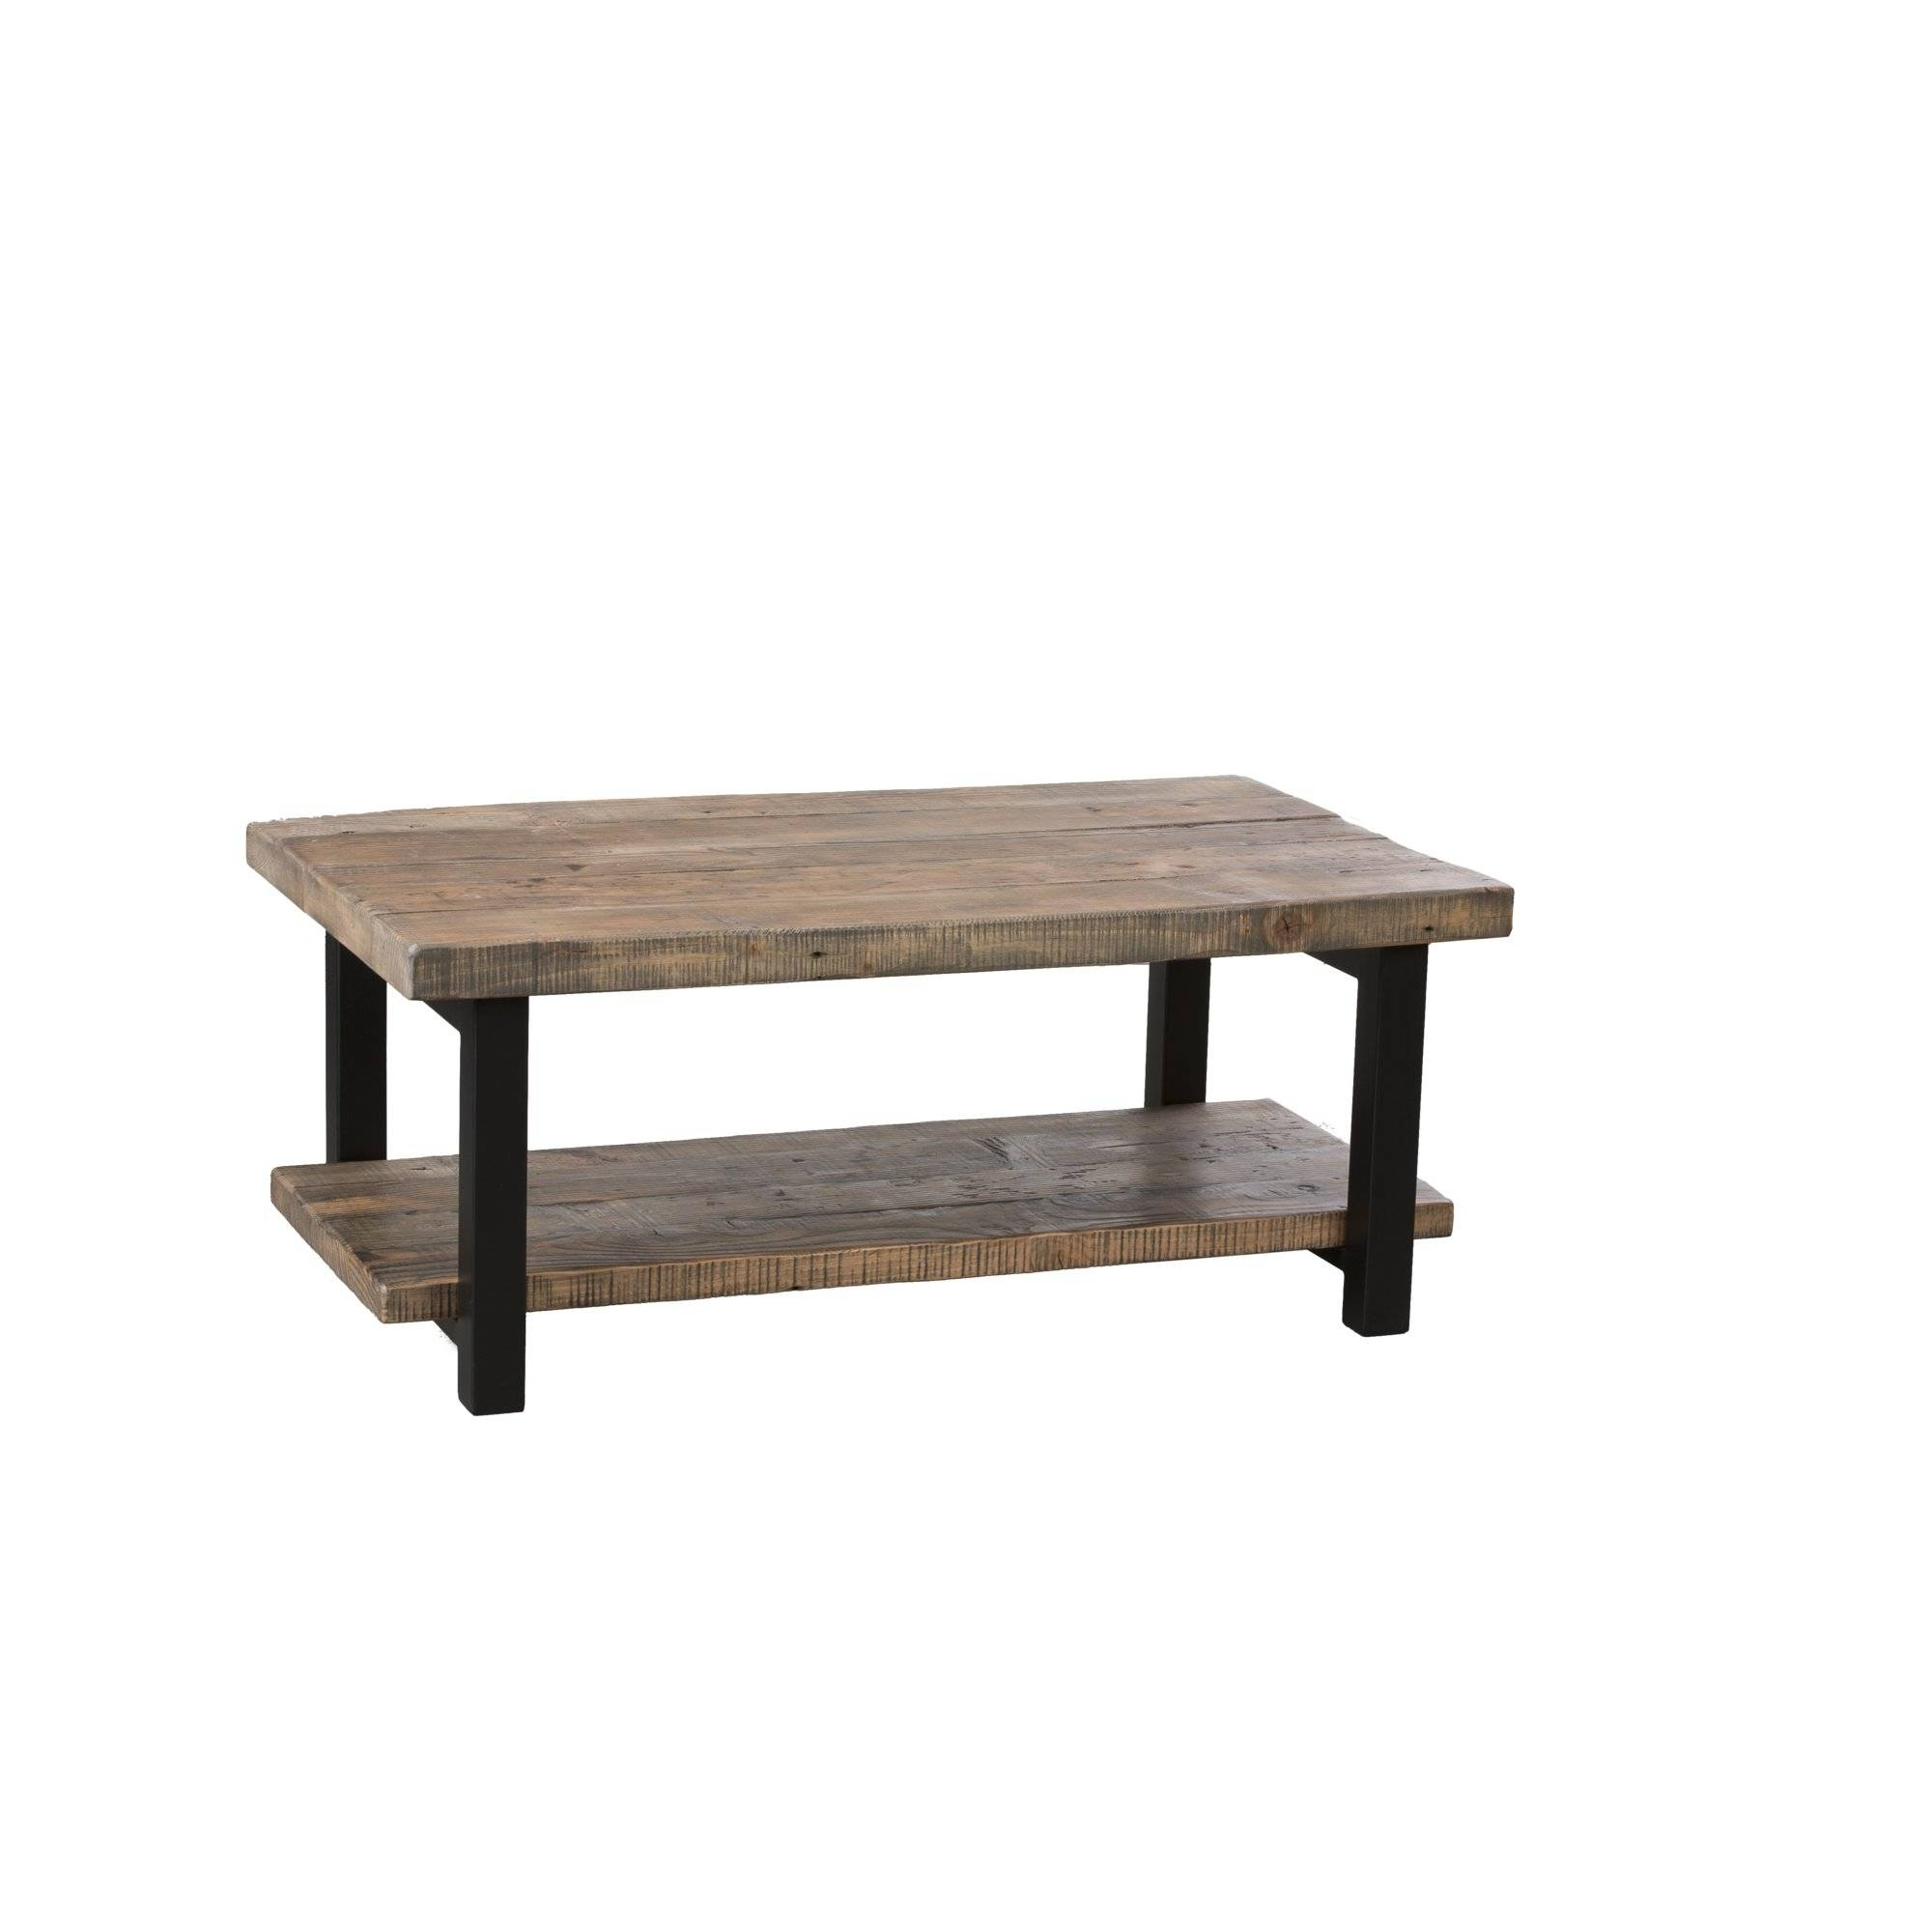 Oak Sleeper Coffee Table ~ Instacoffeetable intended for Oak Sleeper Coffee Tables (Image 3 of 15)